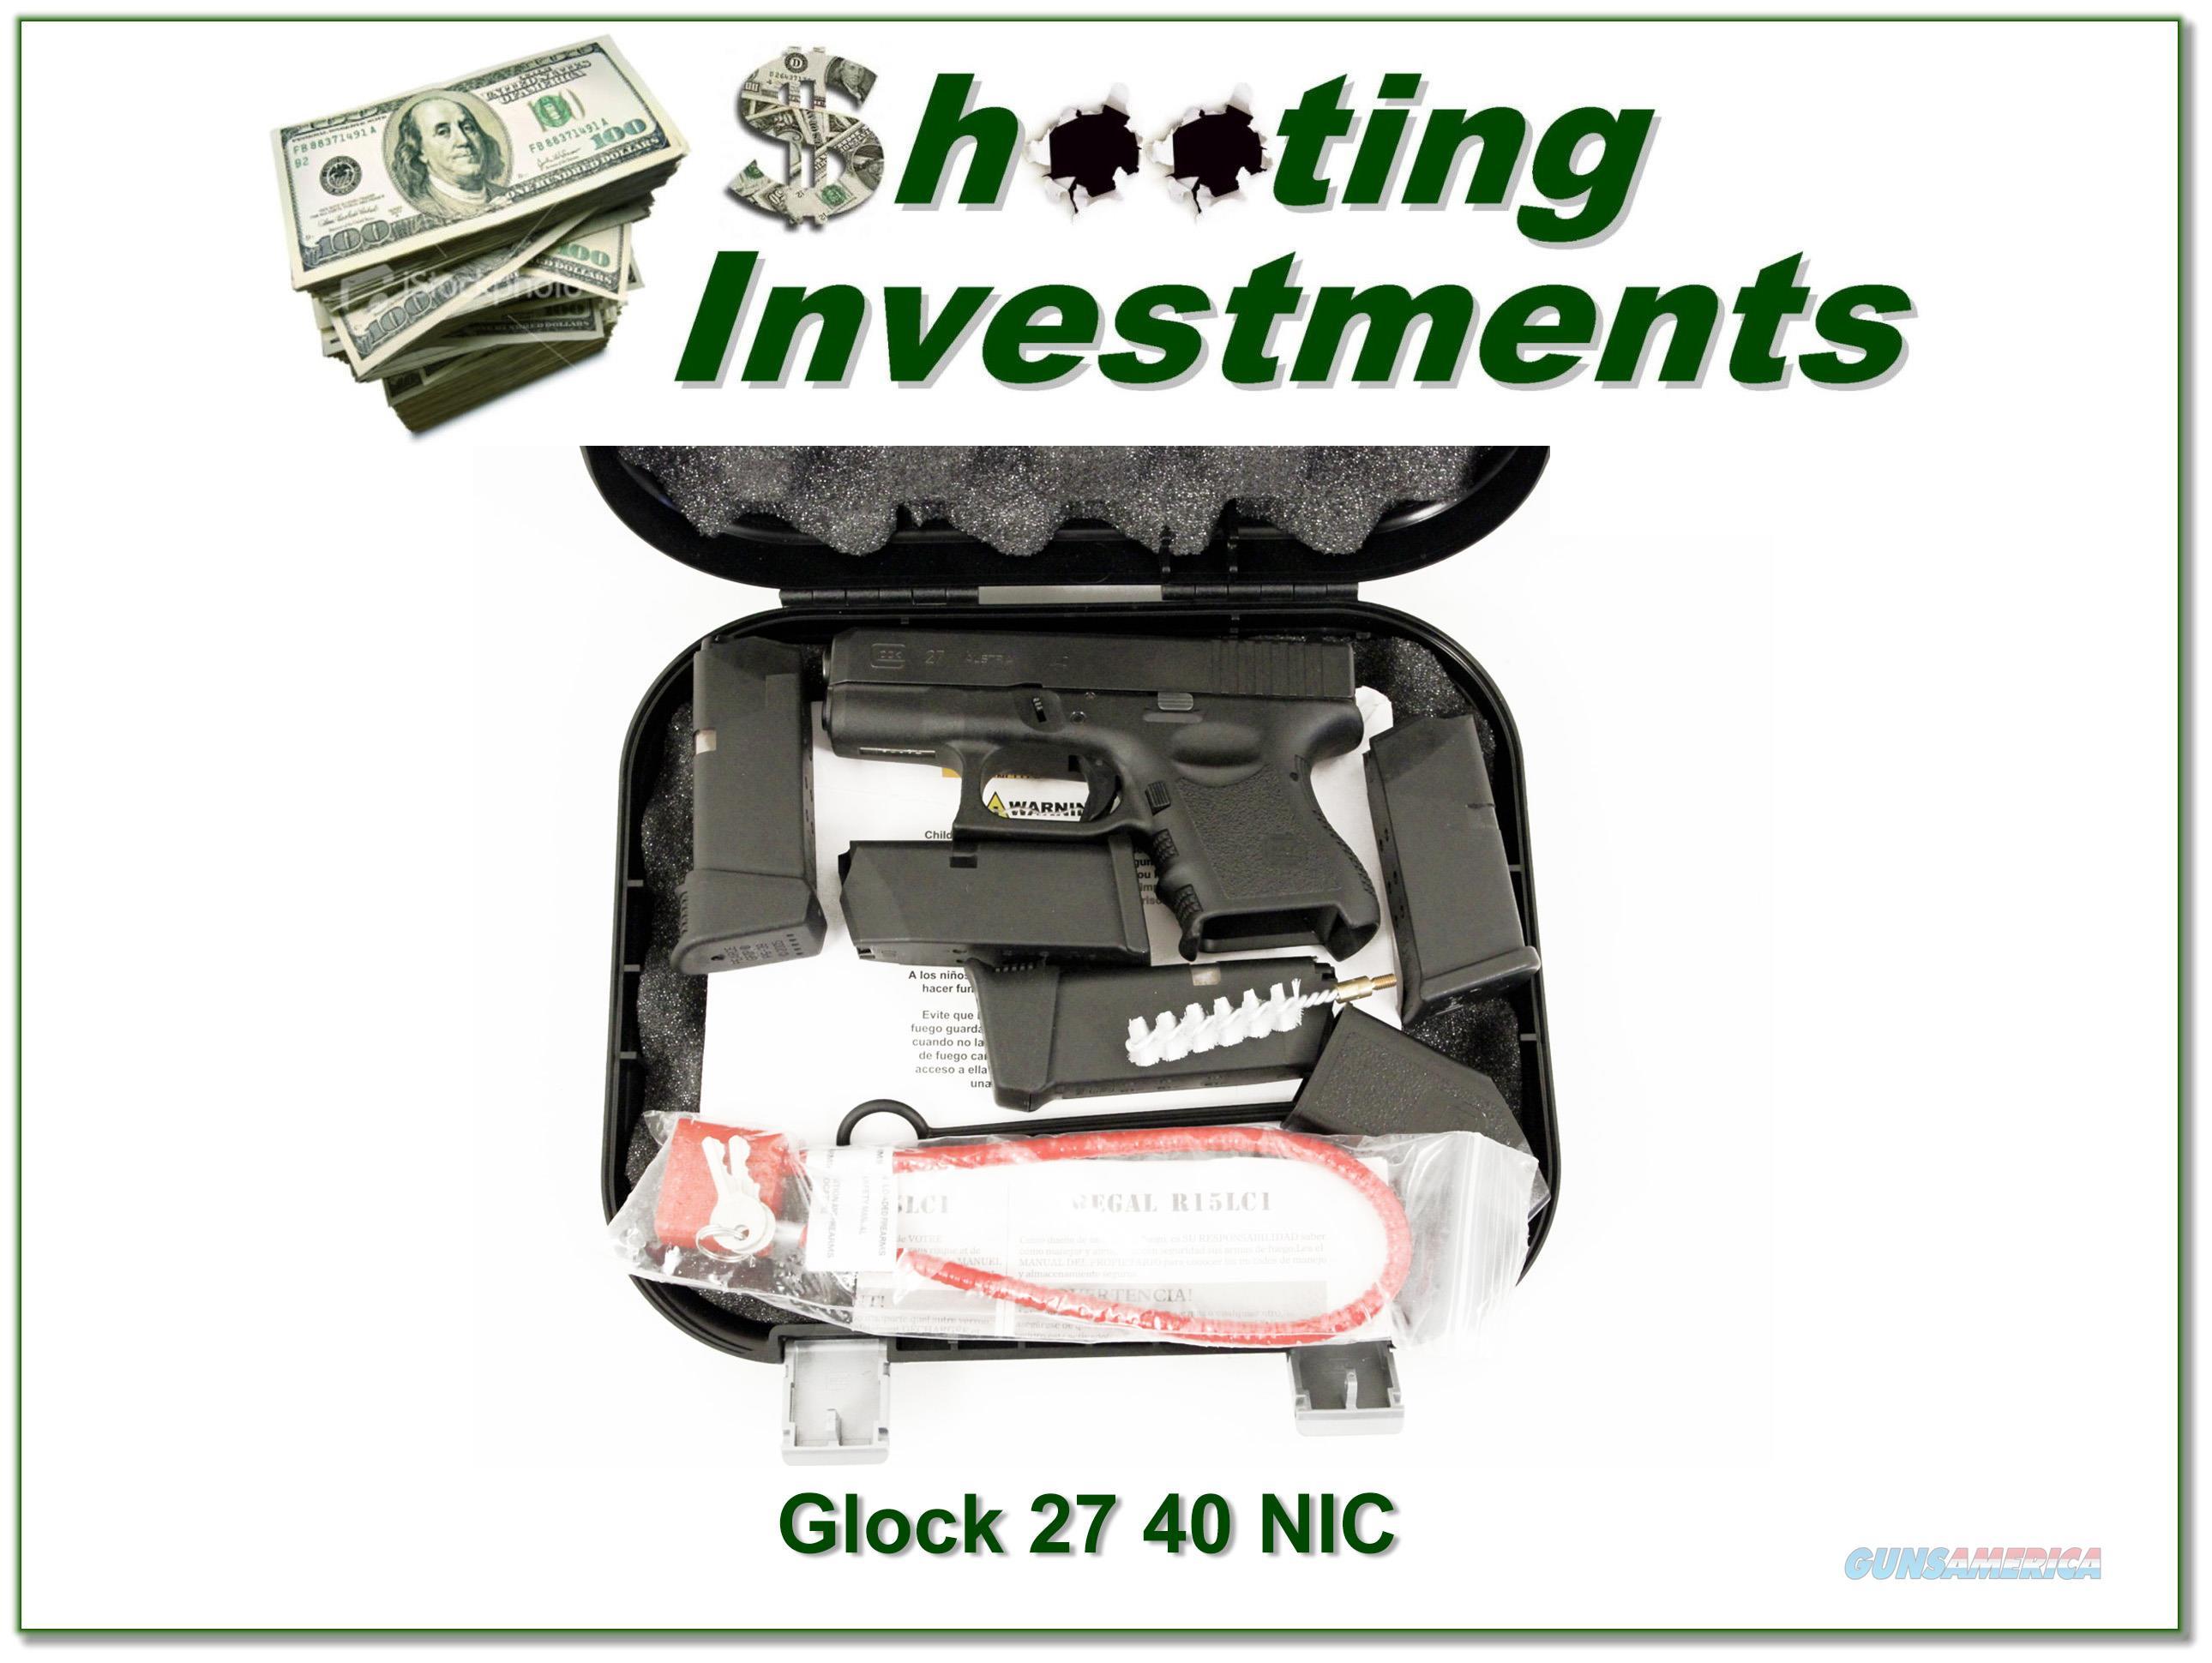 Glock 27 4 S&W NIC!  Guns > Pistols > Glock Pistols > 26/27